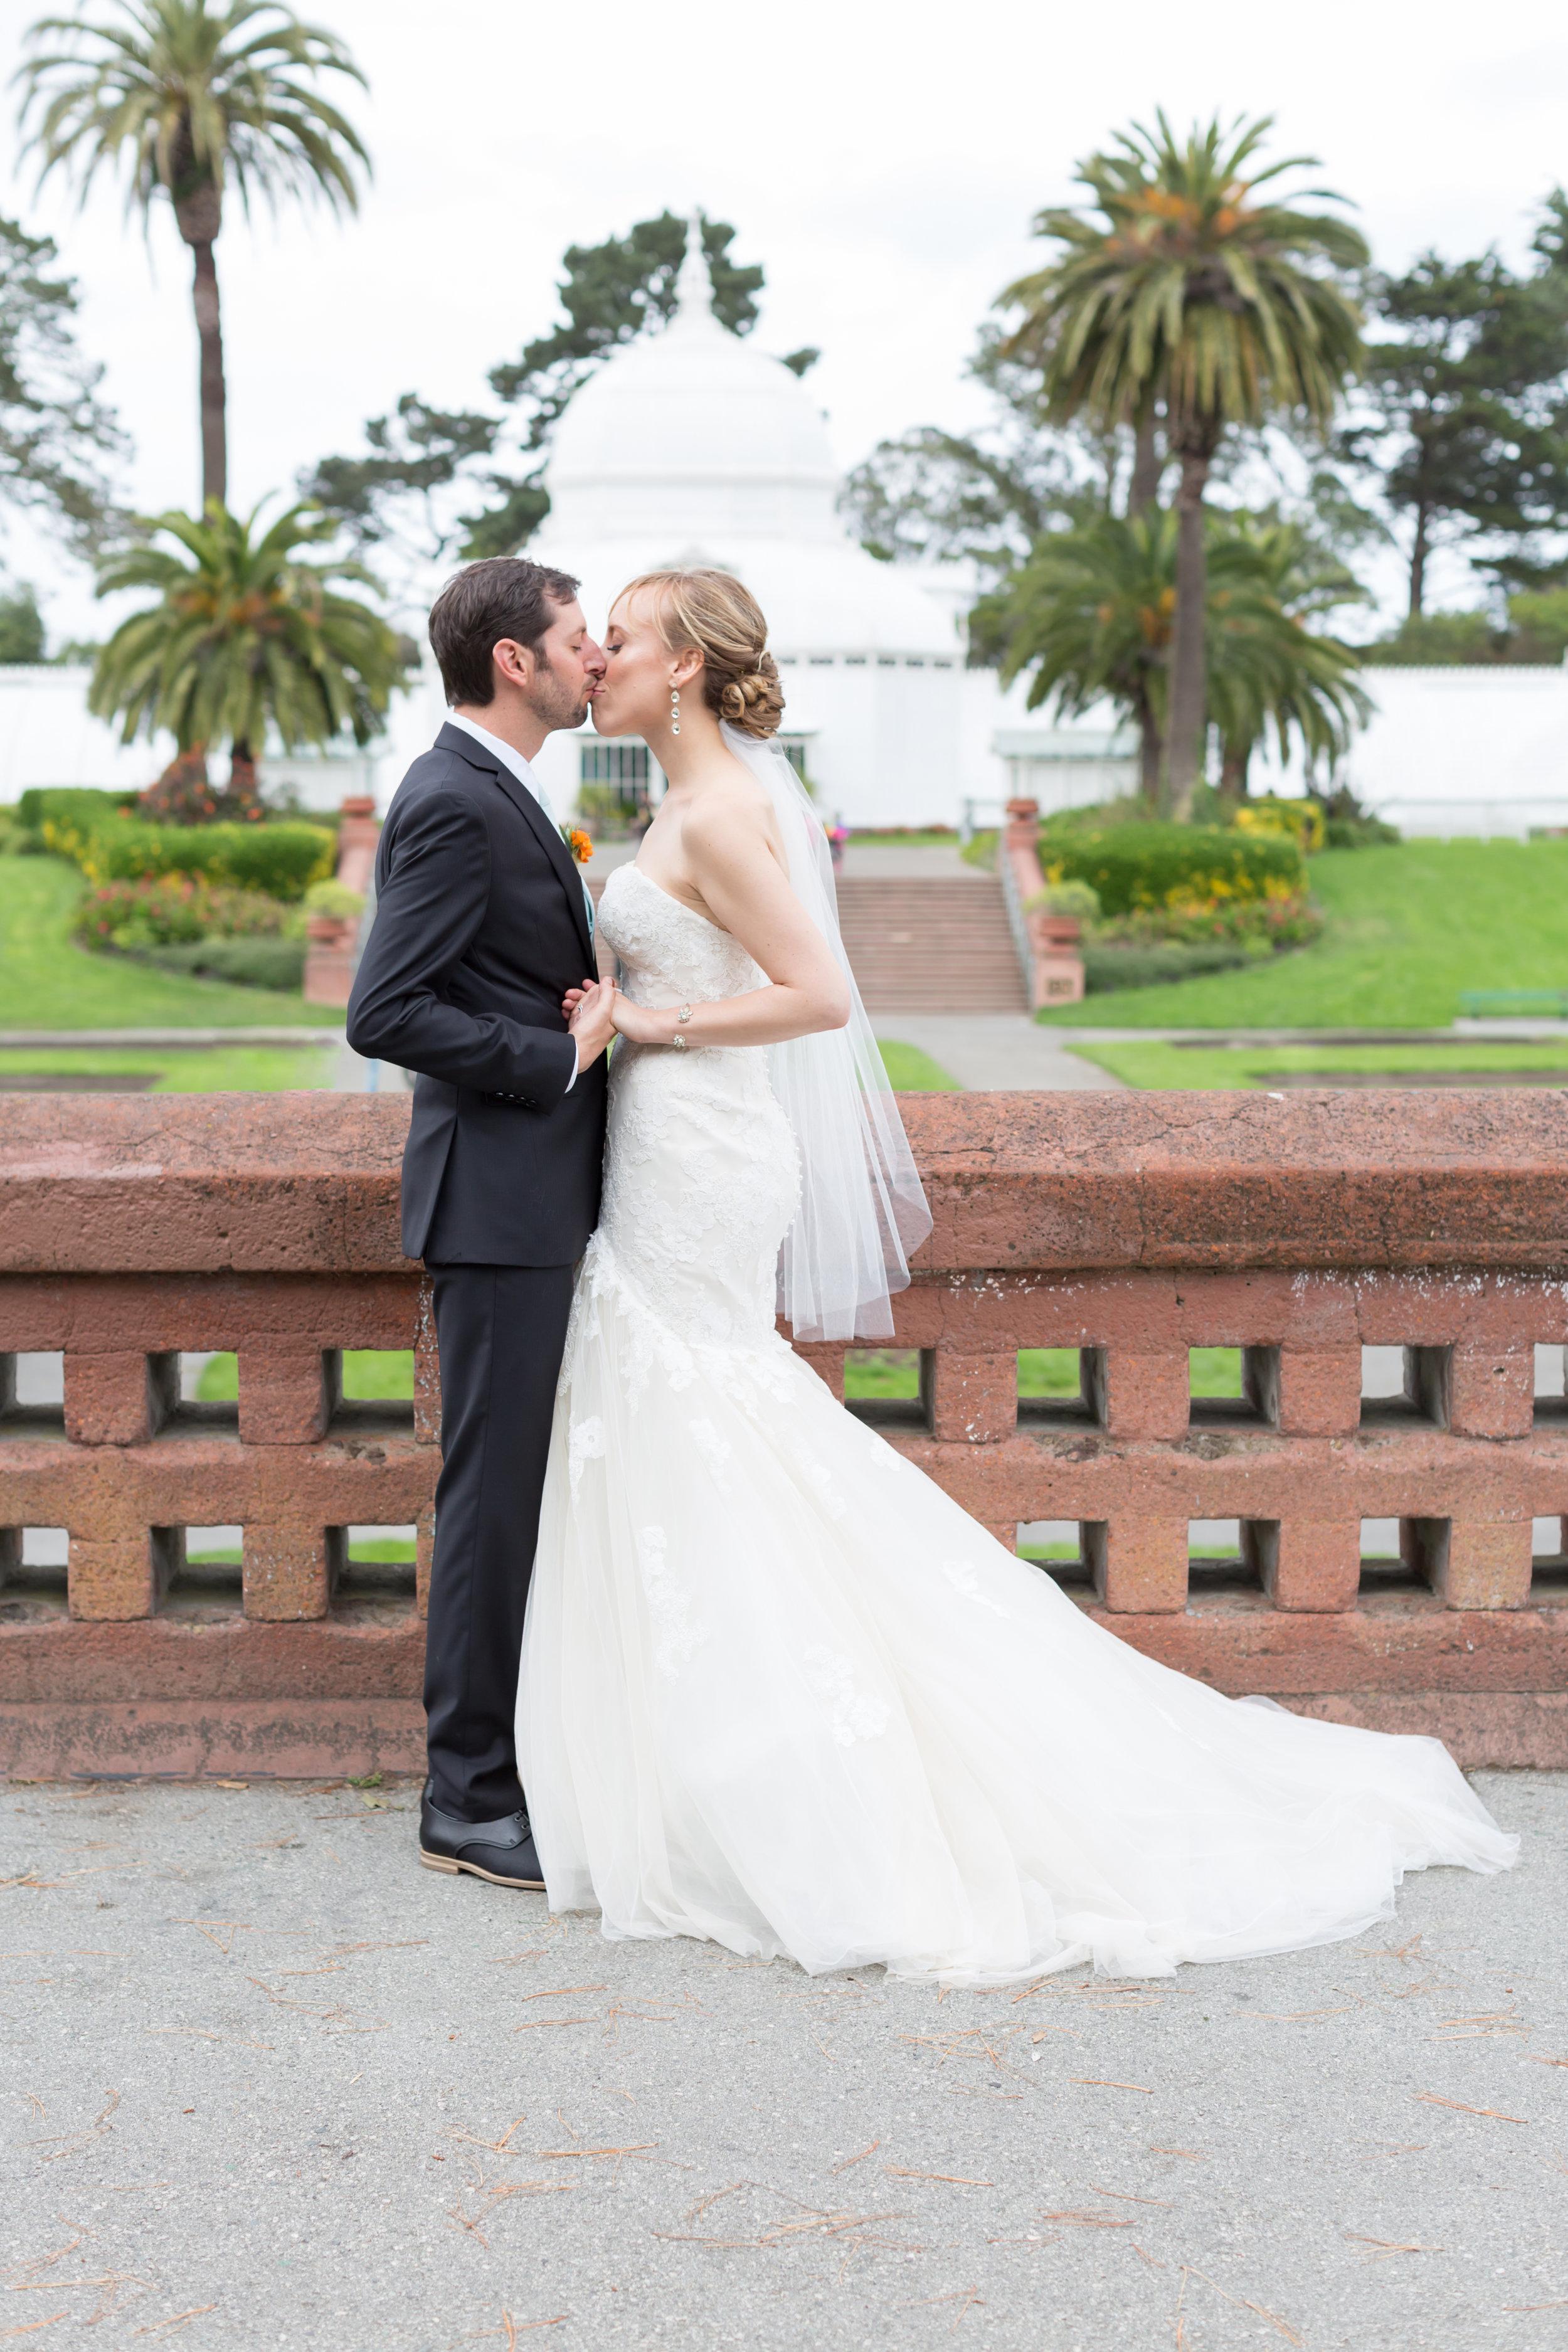 San-Francisco-Wedding-17.jpg